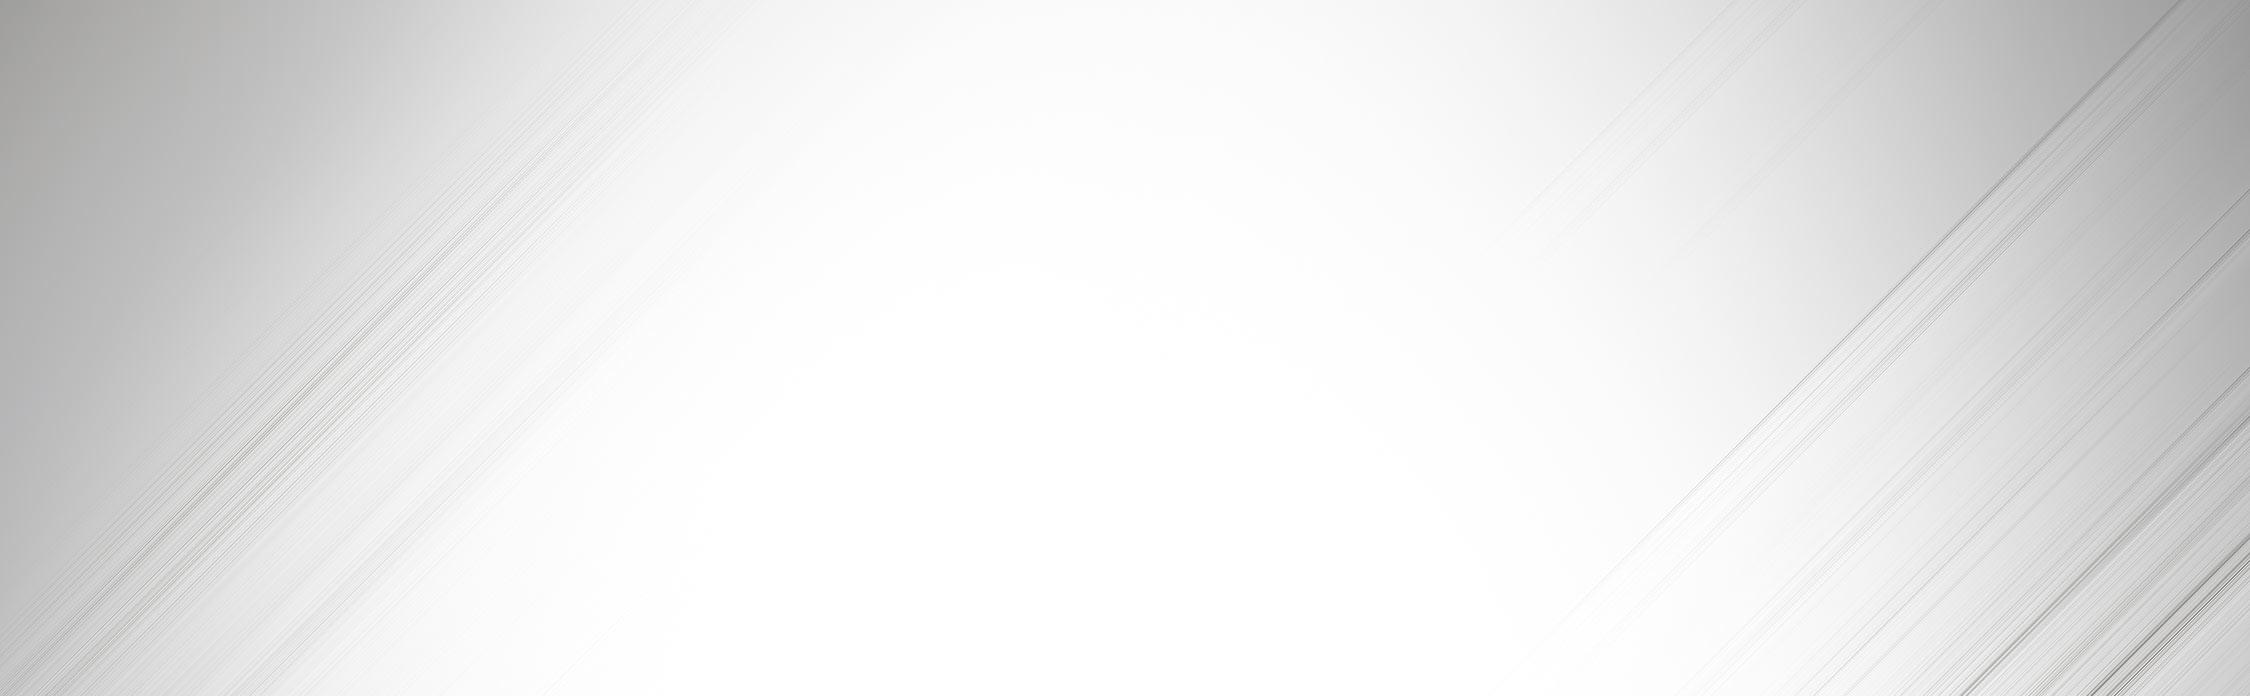 bayside machine corporation,metal shops, metal fabrication near me, machine shops near me, metal fabricators, metal fabricator, fabrication of metal, fabricators metal, custom metal fabrication near me, metal fabrication shops near me, custom metal fabrication, metal fab, cnc shop near me, horizontal milling machines, auto machine shop near me, aluminium fabrication, stainless steel fabricators, custom sheet metal, custom metal fabricators, aluminum fabricators near me, cnc metal milling machine, fabrication steel, steel metal fabrication,